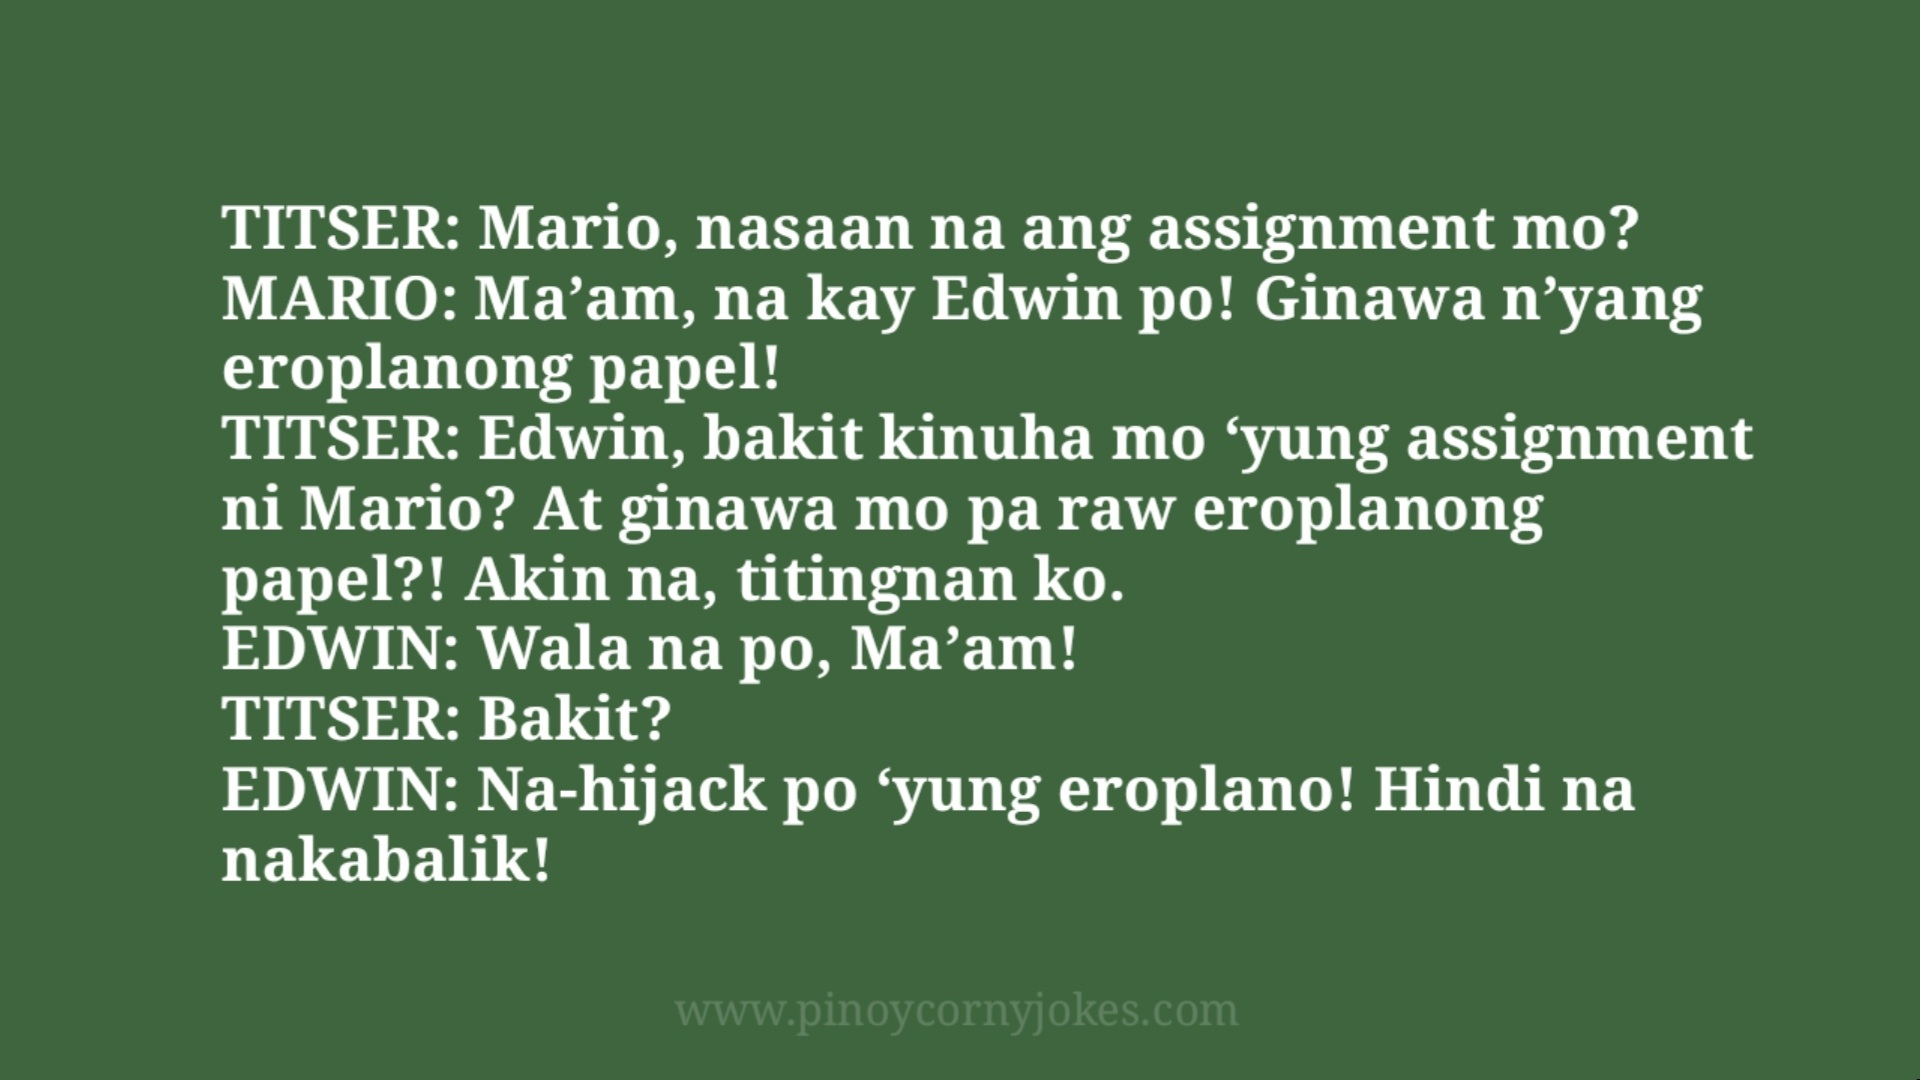 saan ang assignment pinoy jokes estudyante